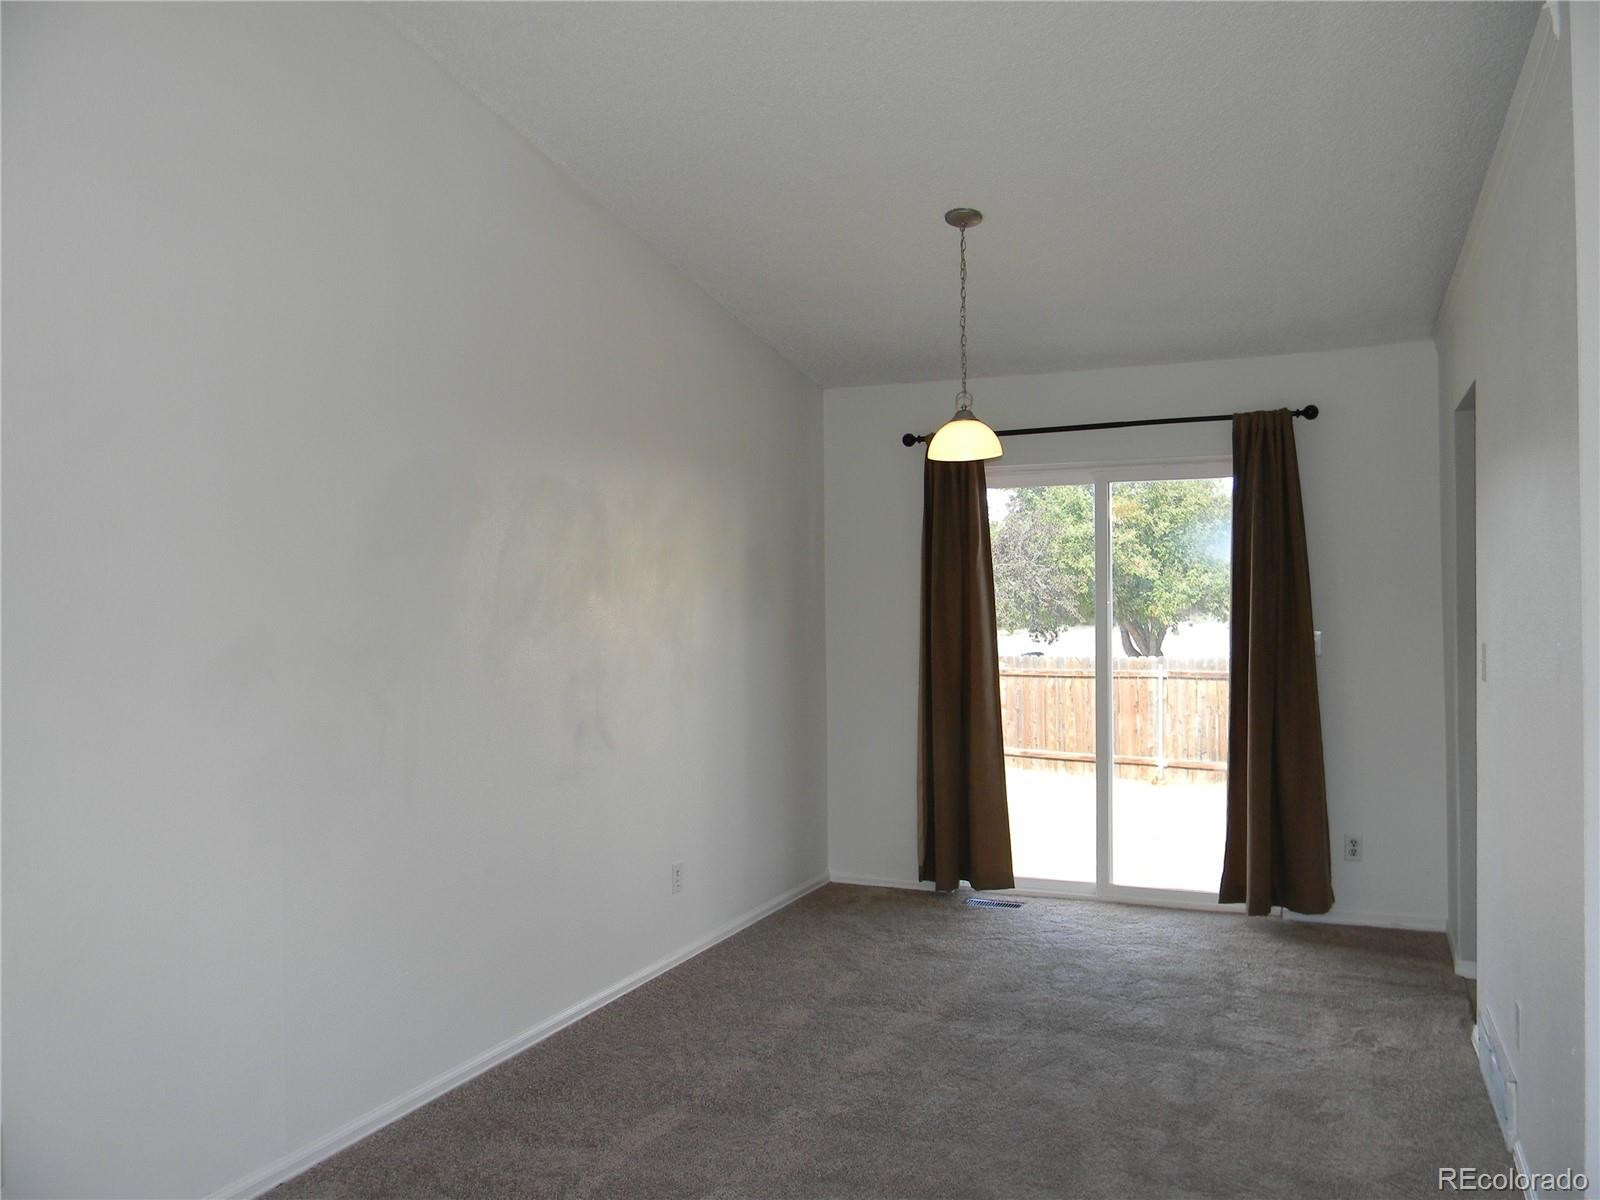 MLS# 5946356 - 9 - 4920 Ridenour Drive, Colorado Springs, CO 80916